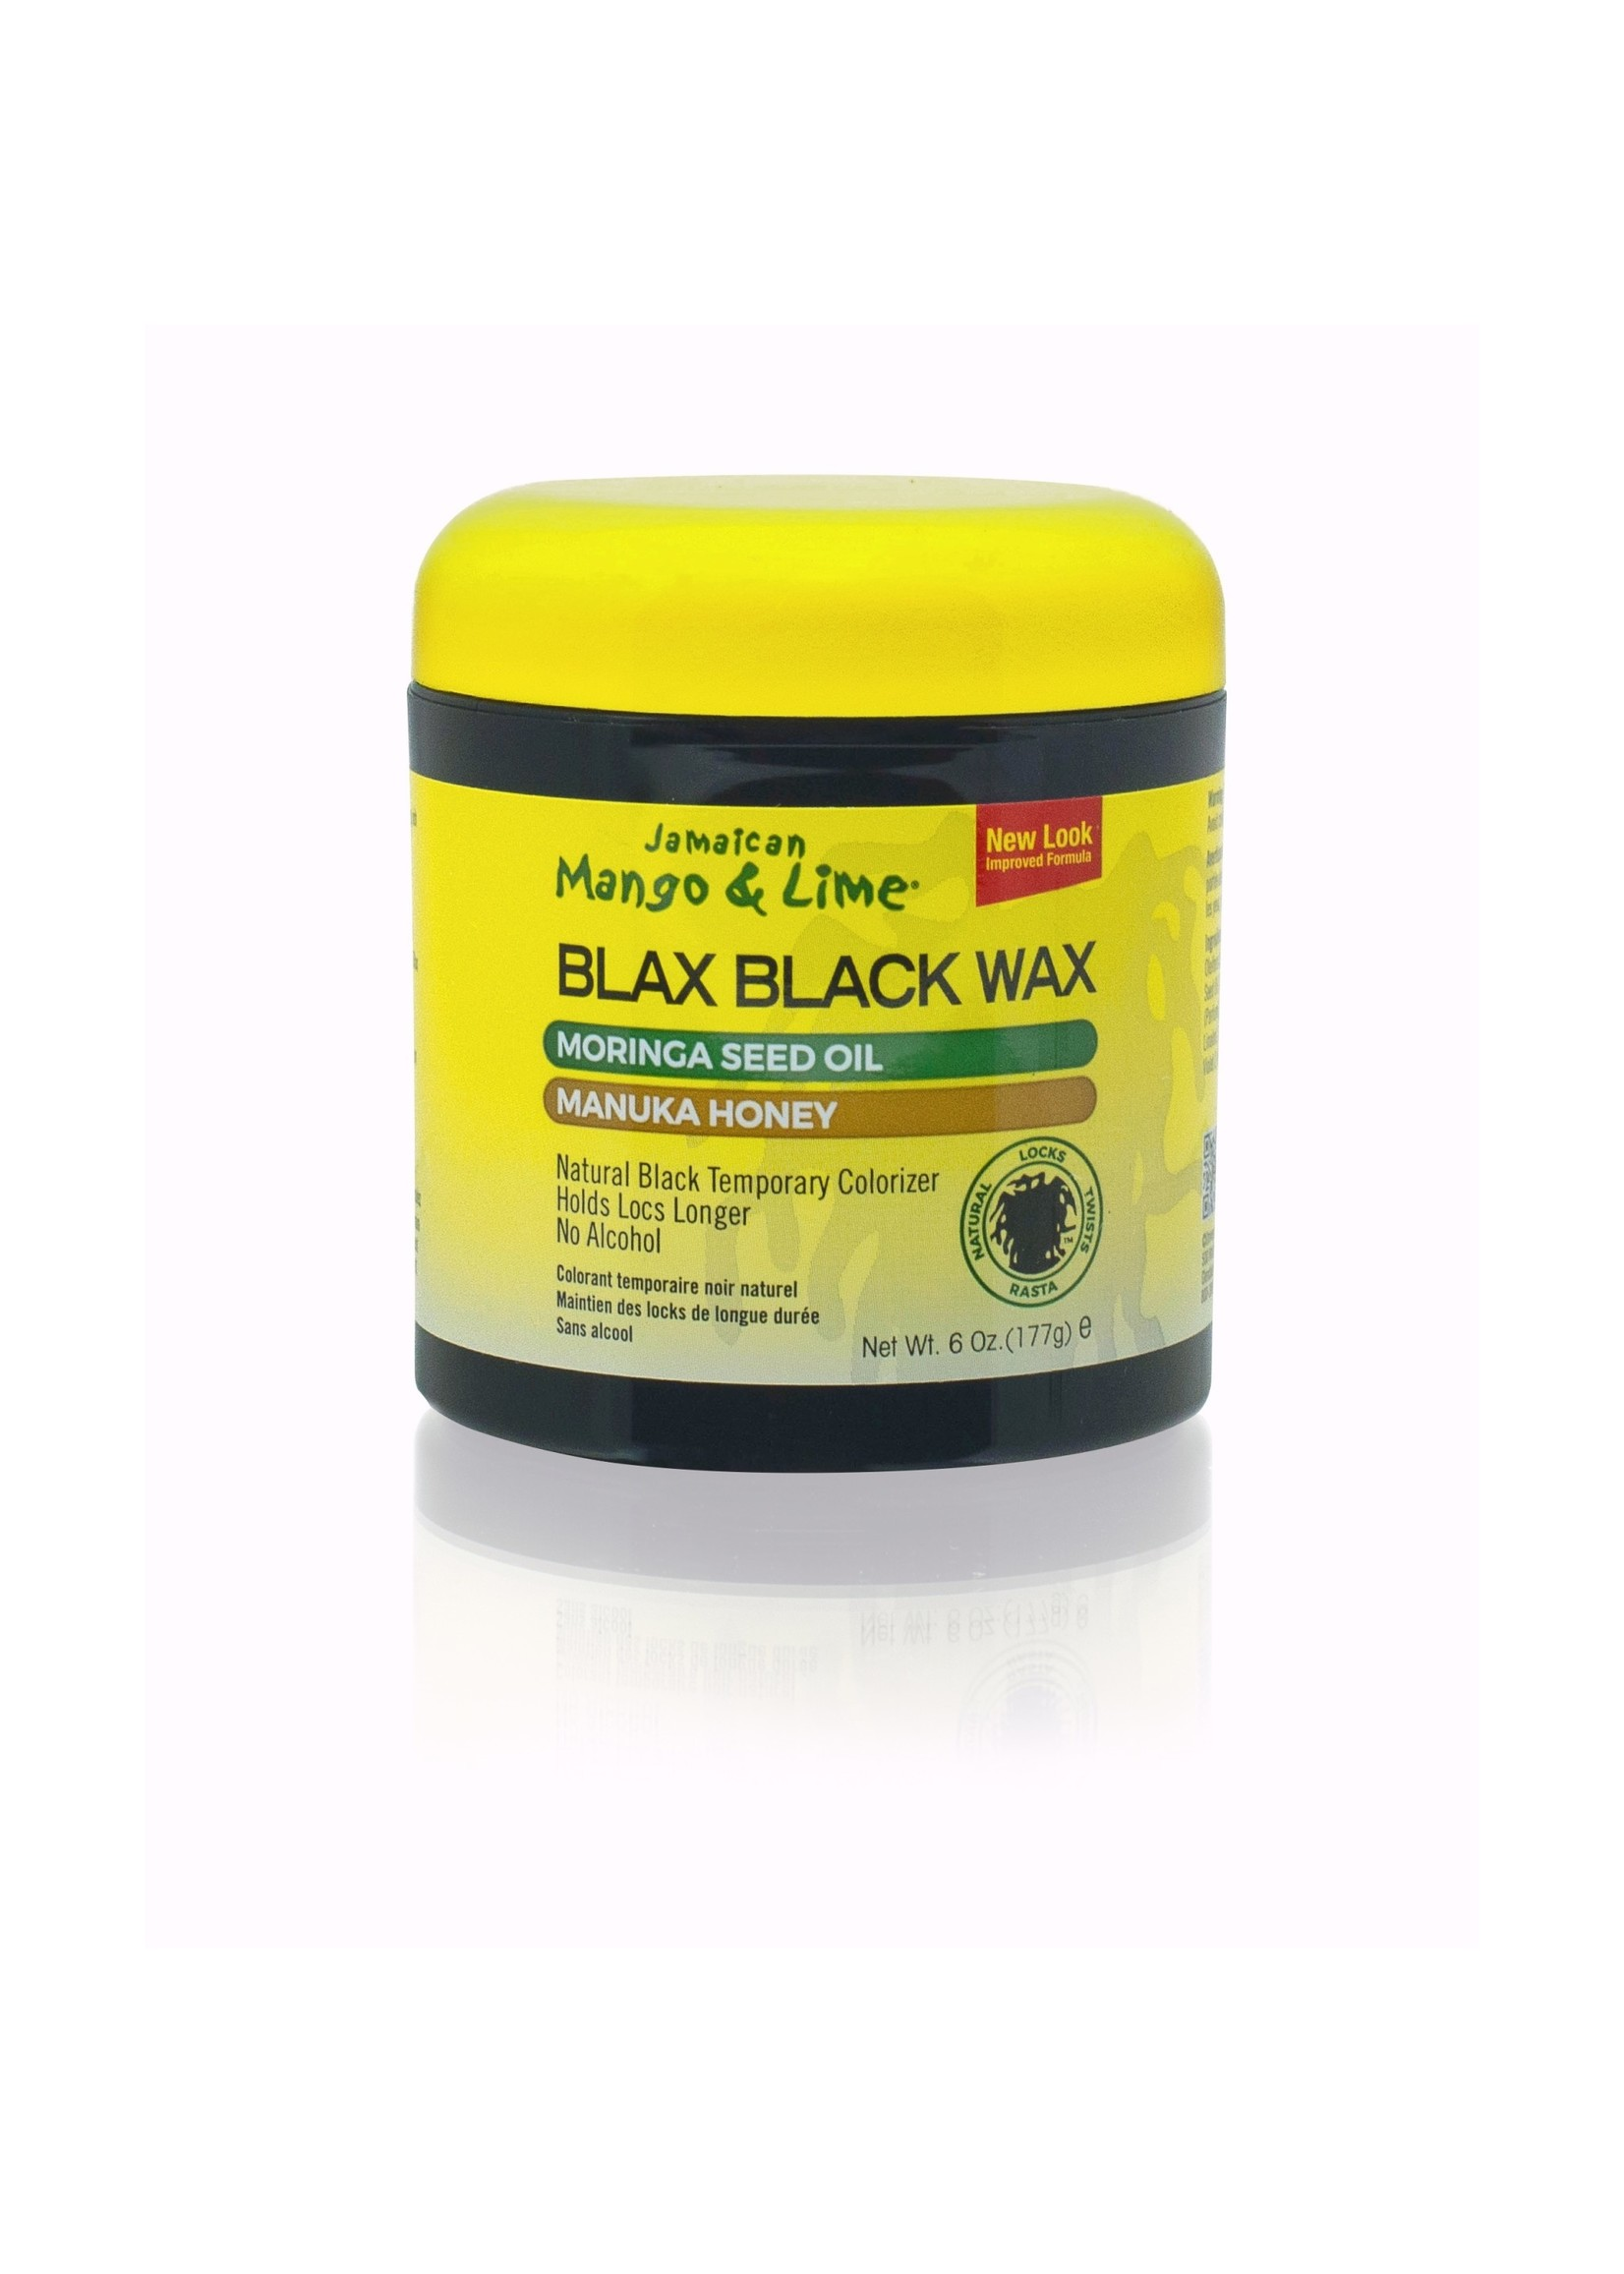 Jamaican Mango & Lime Blax Black Wax